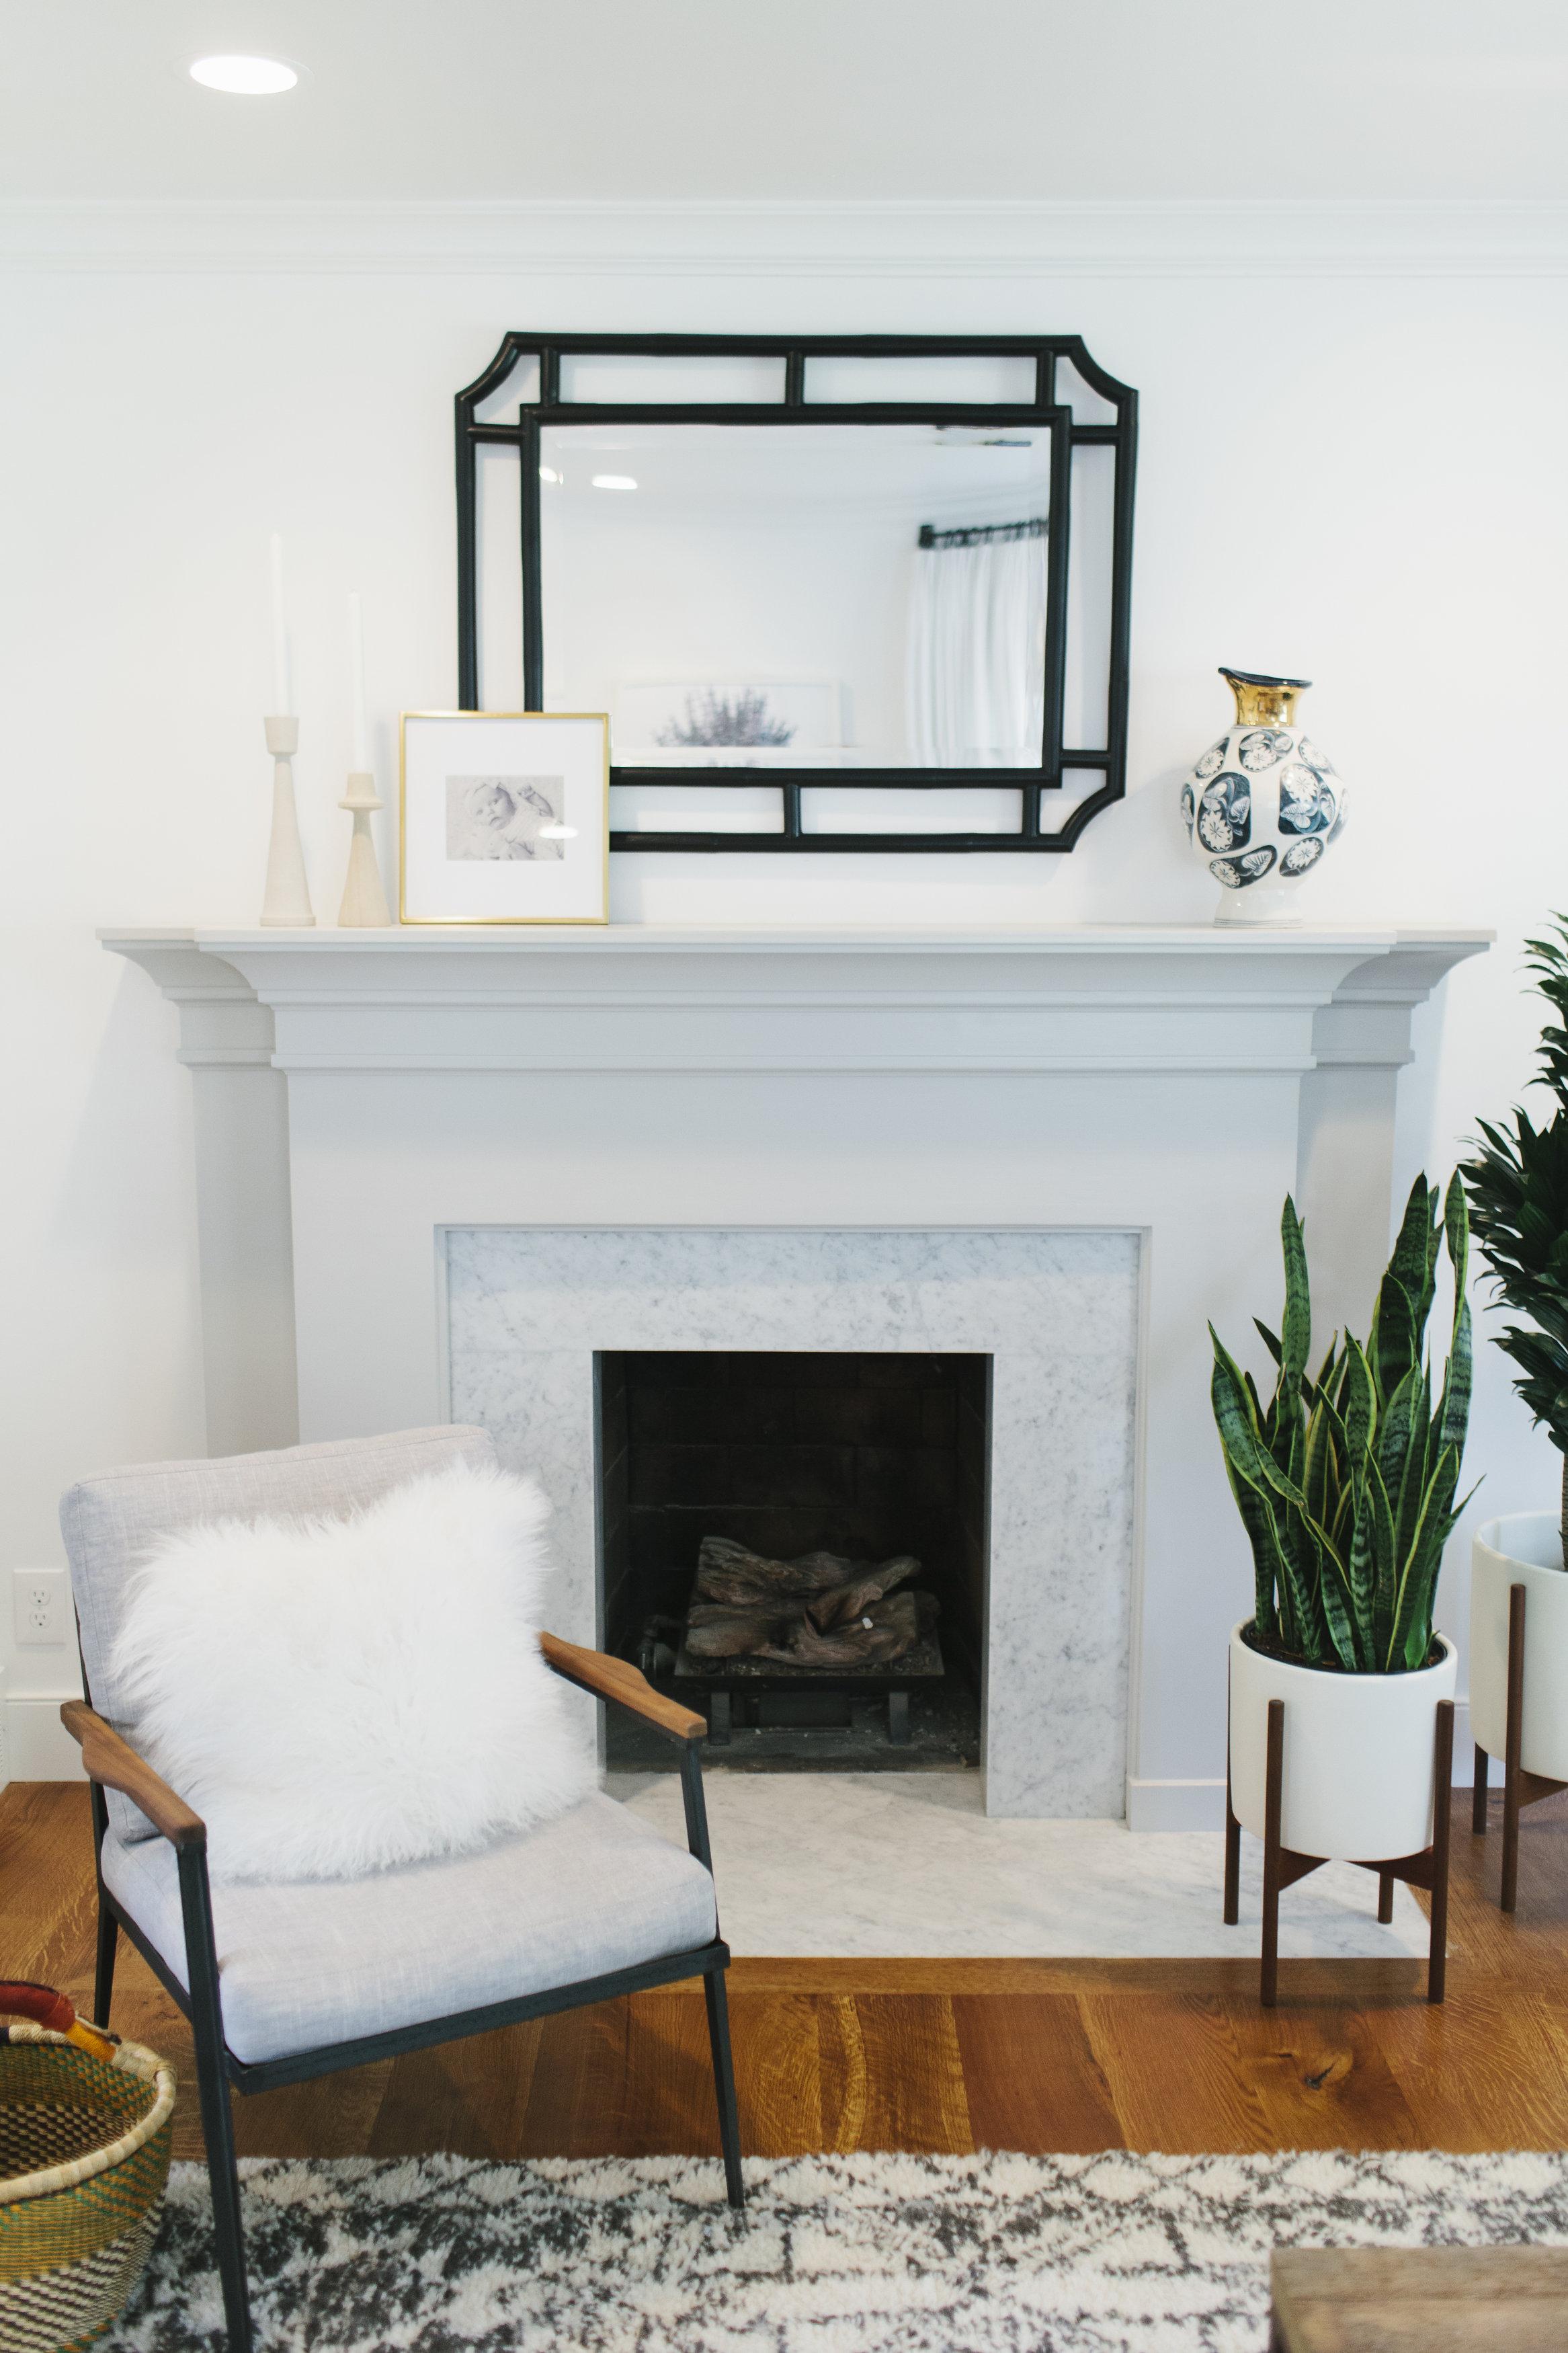 Studio McGee - Lynwood Remodel Fireplace